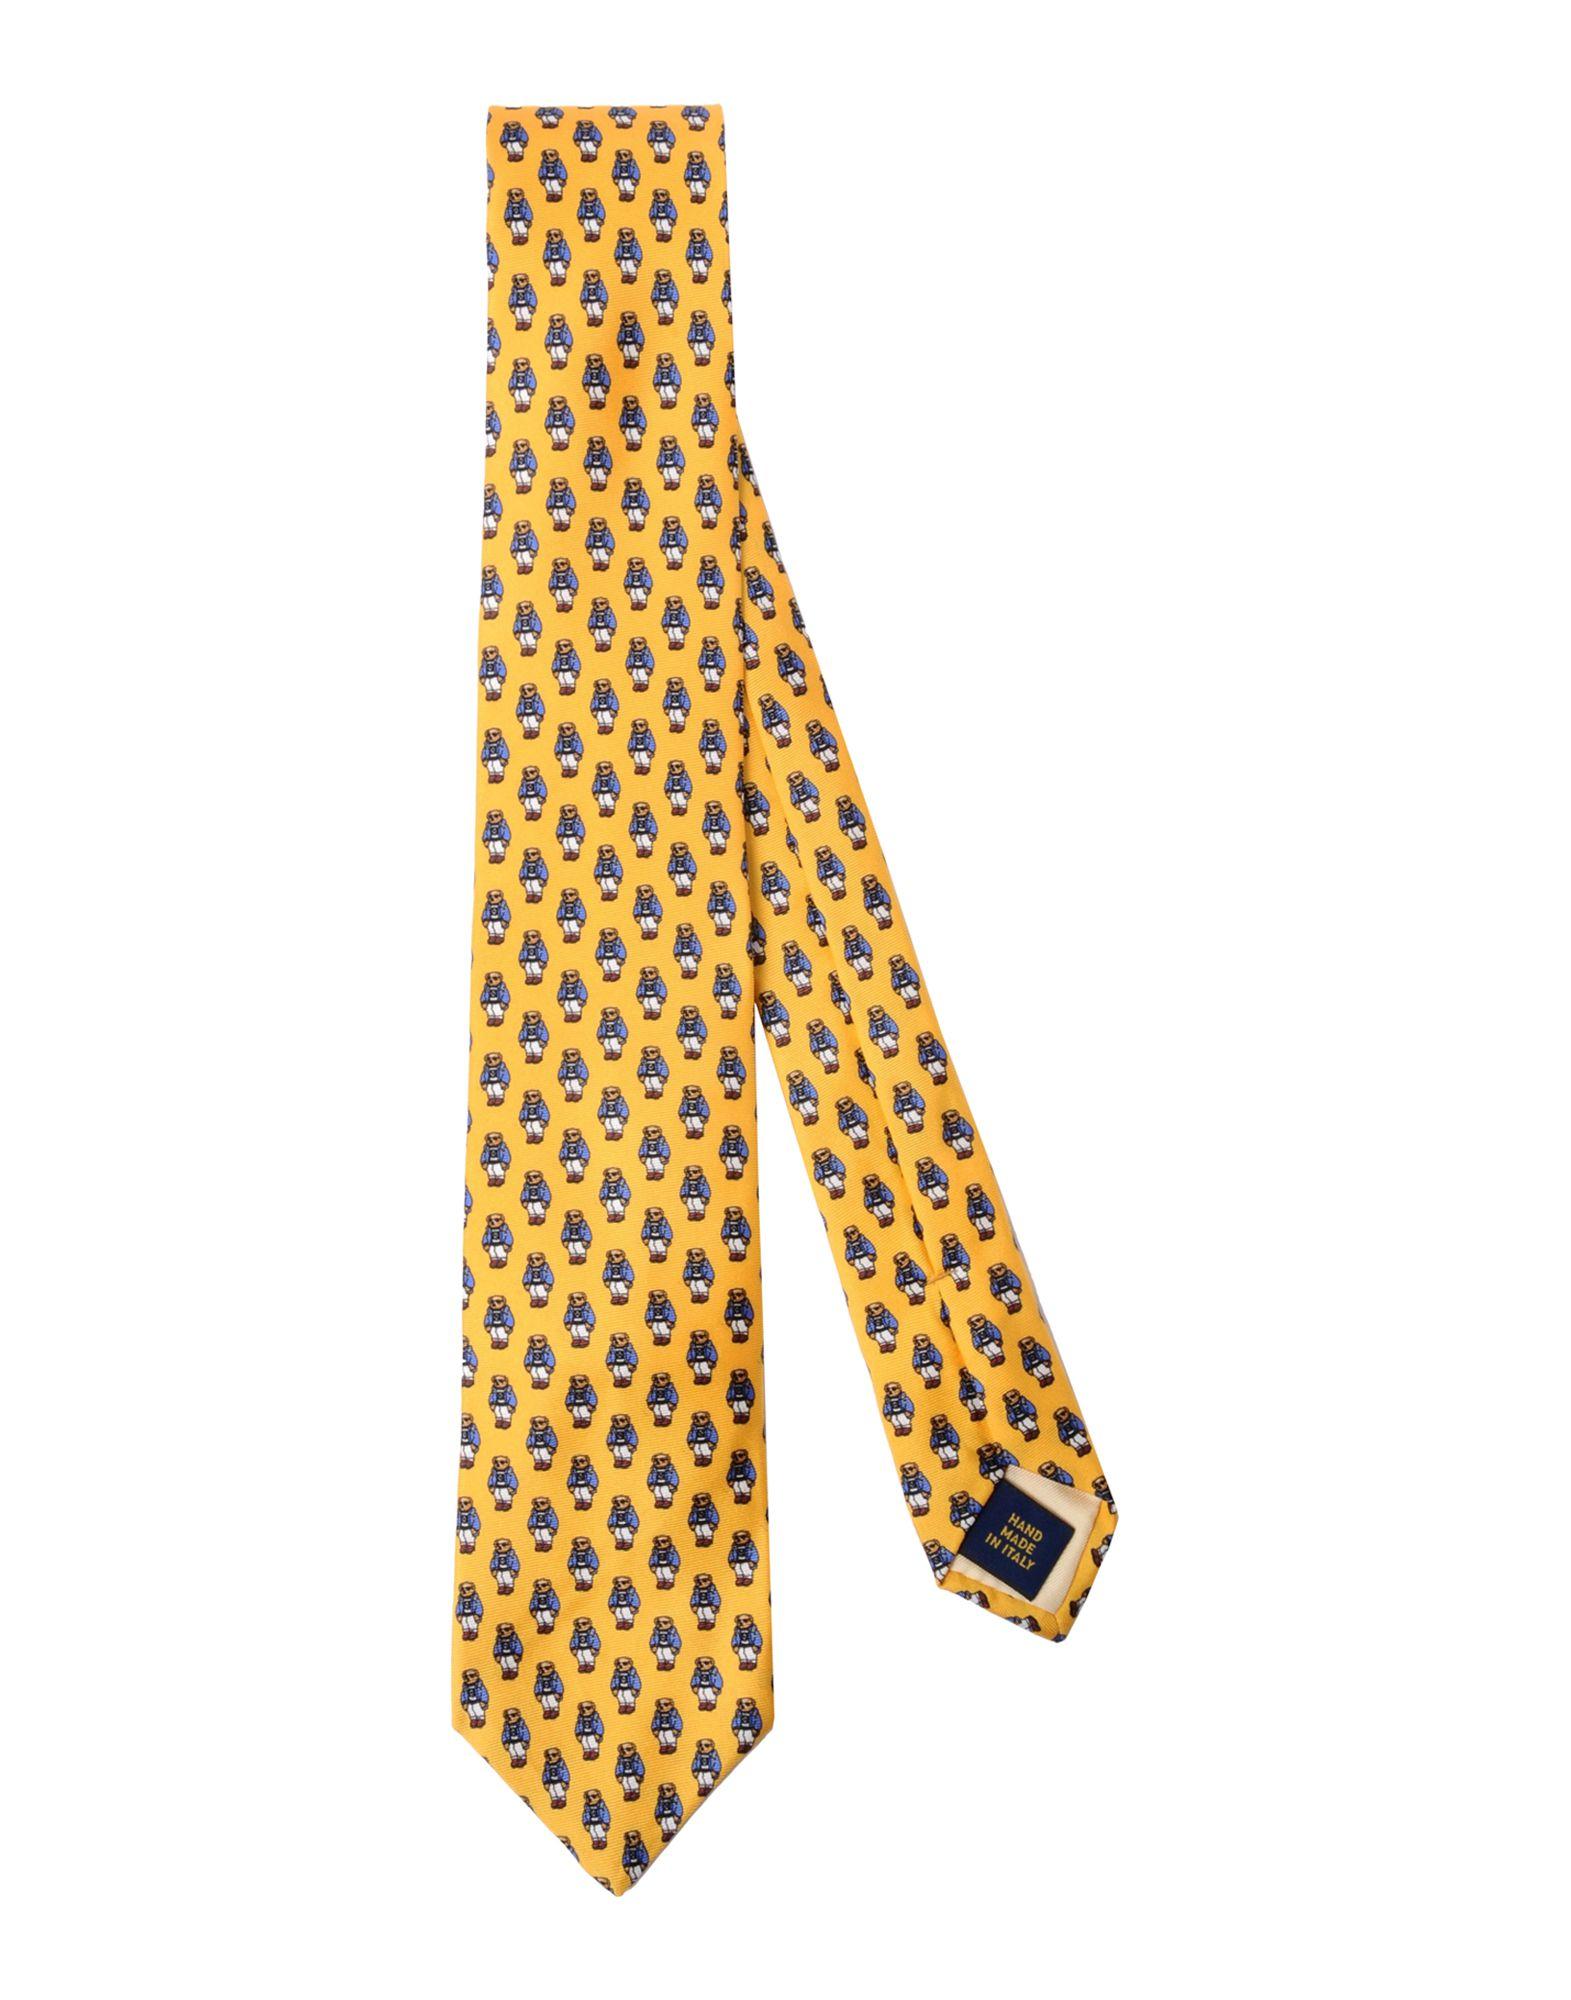 buy online cef59 325cd Cravatta Polo Ralph Lauren Uomo - Acquista online su YOOX ...